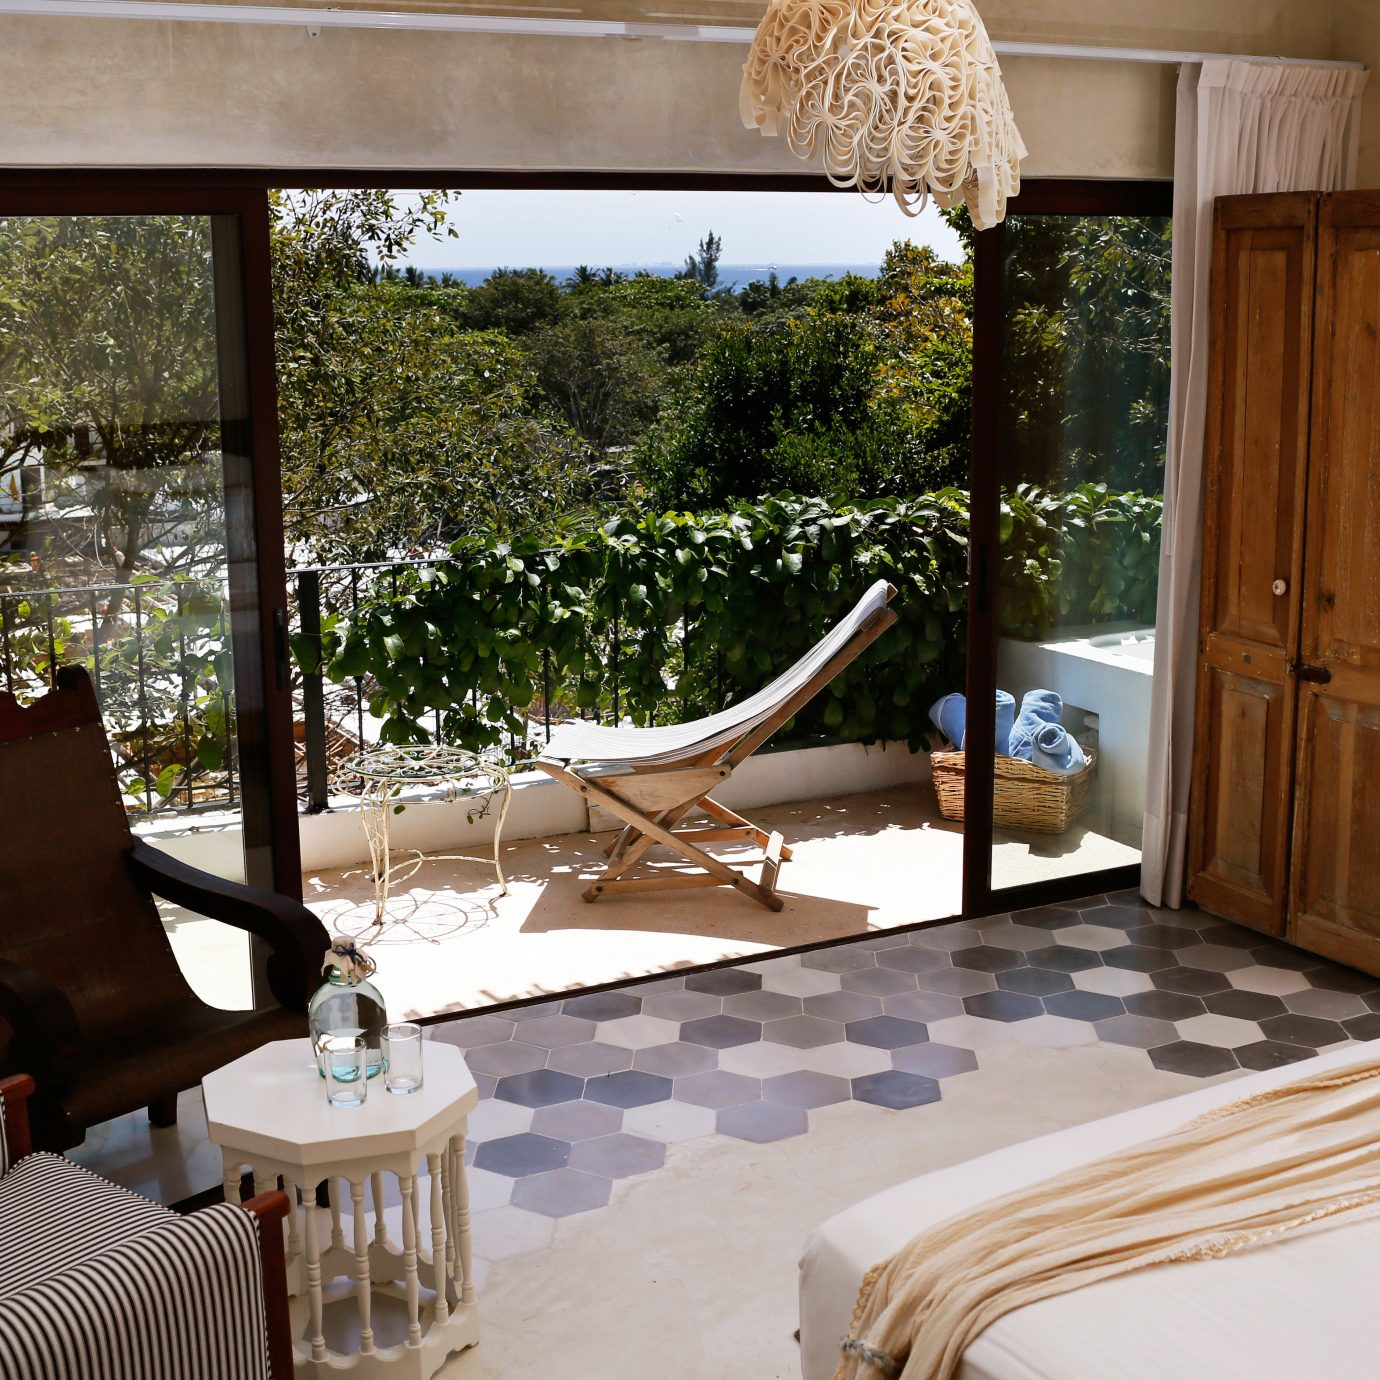 Balcony Bedroom Boutique Budget Rustic Tropical property house home living room Villa cottage Suite farmhouse